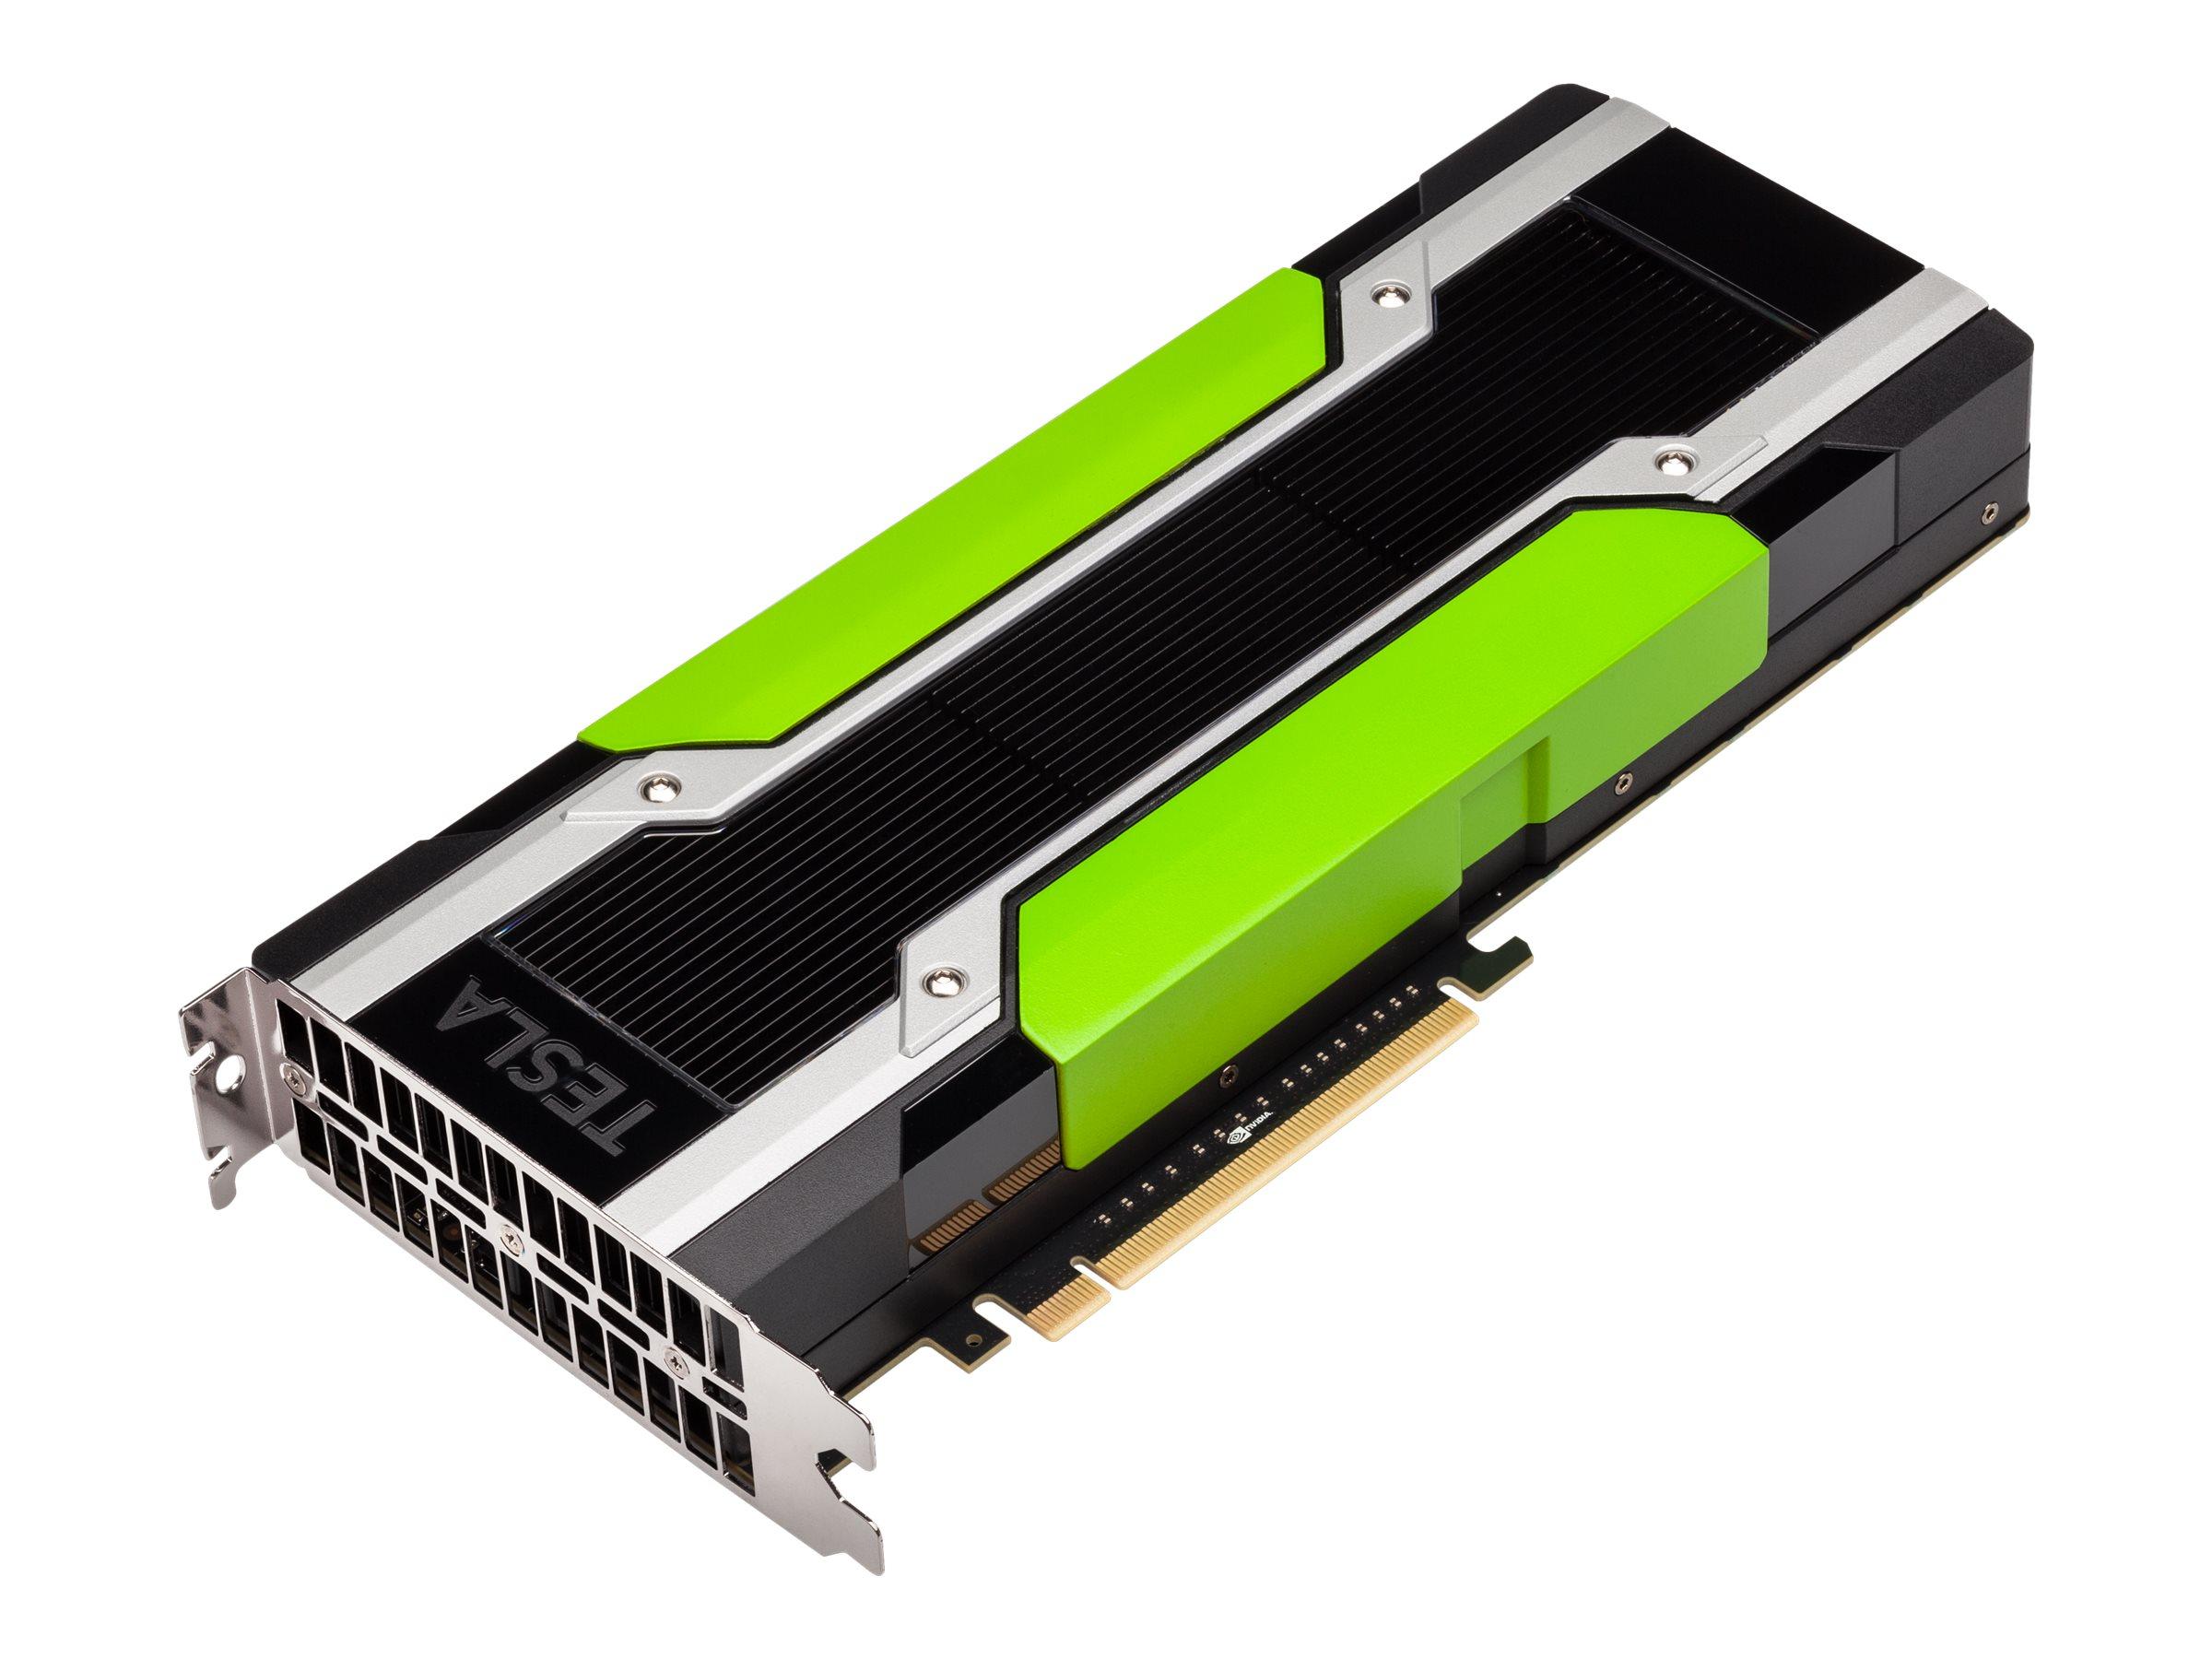 NVIDIA Tesla M40 - GPU-Rechenprozessor - Tesla M40 - 24 GB GDDR5 - PCIe 3.0 x16 - ohne Lüfter